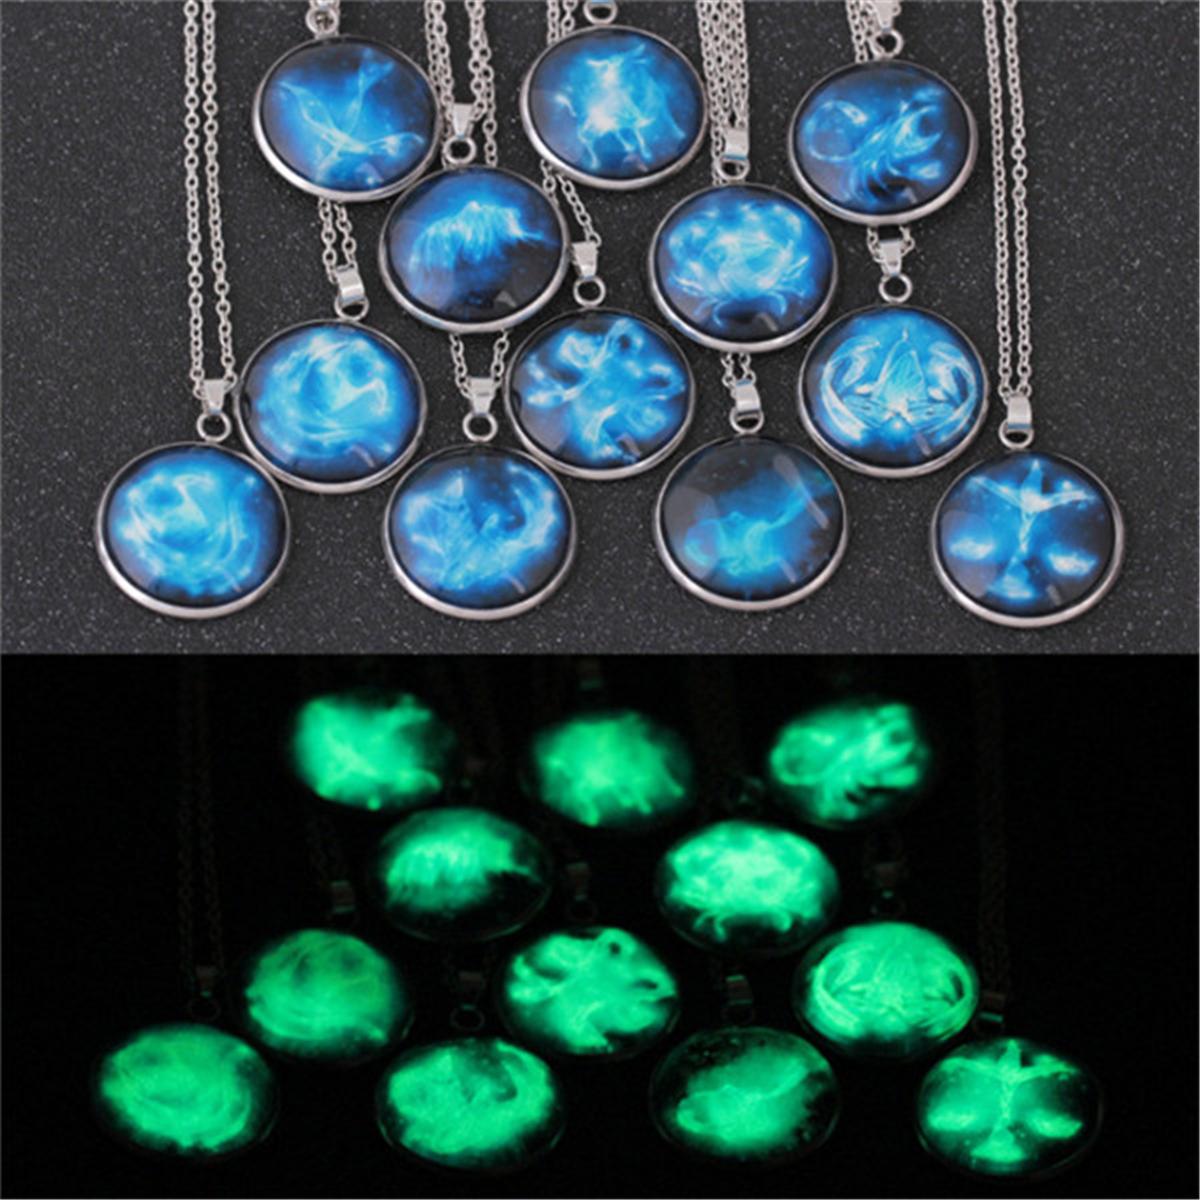 12 Constellation Luminous Glow In Dark Zodiac Cabochon Necklace Pendant Fashion